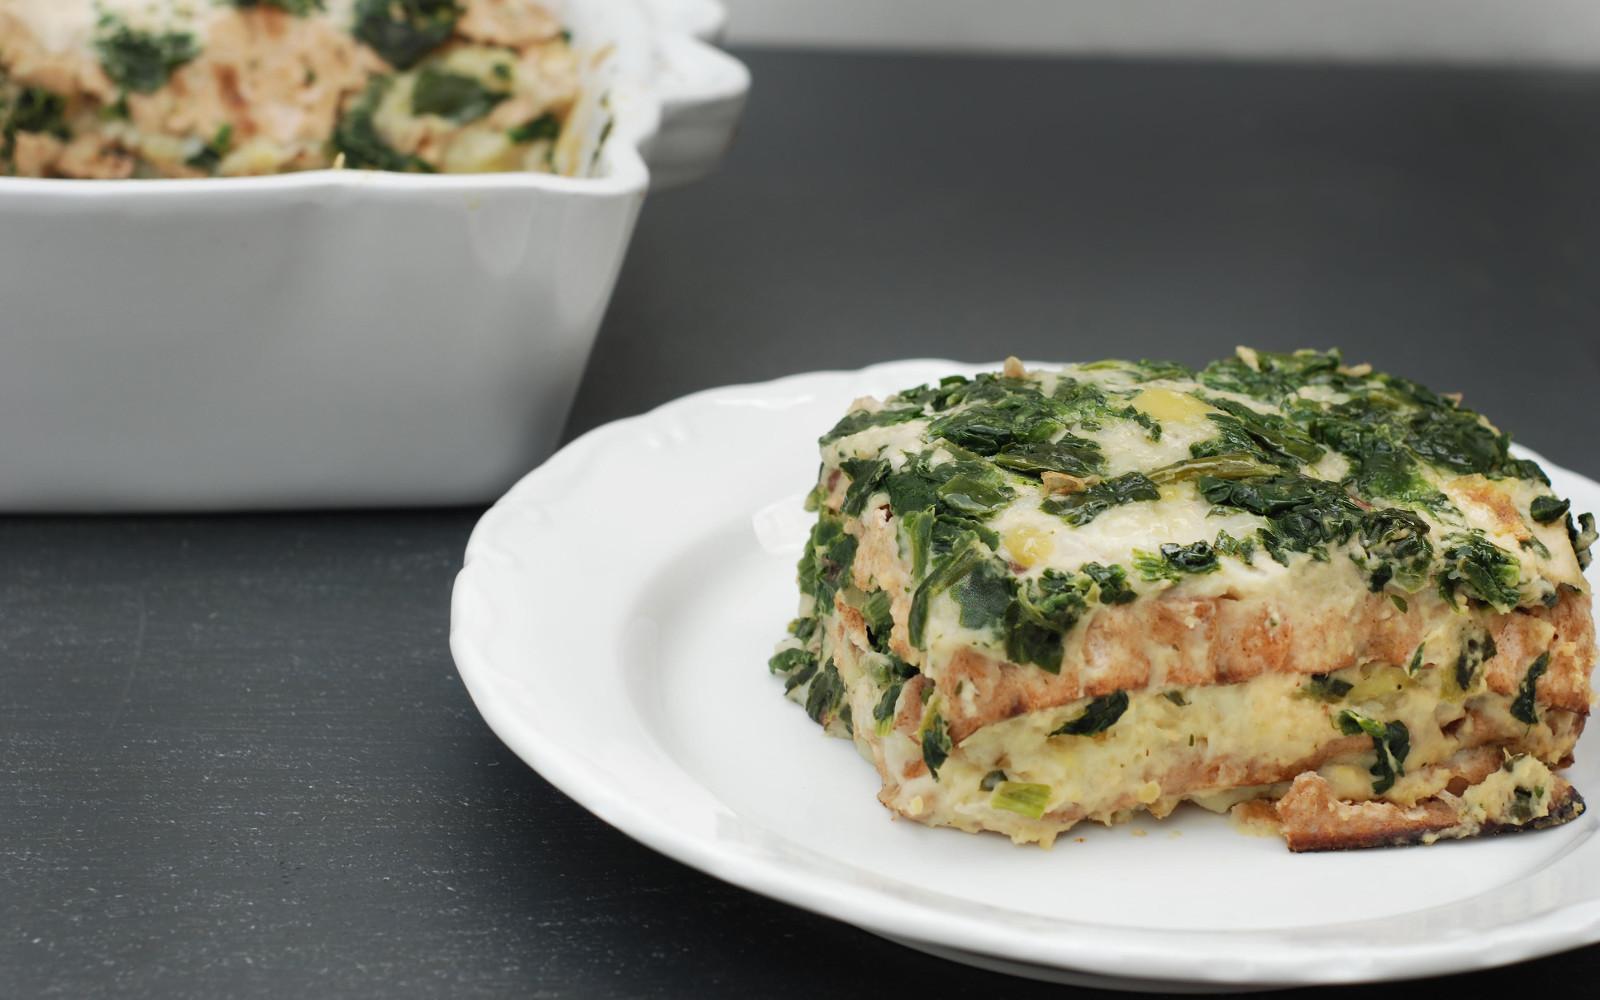 Passover Vegetarian Recipes  Passover Matzo Pie [Vegan] e Green Planet e Green Planet